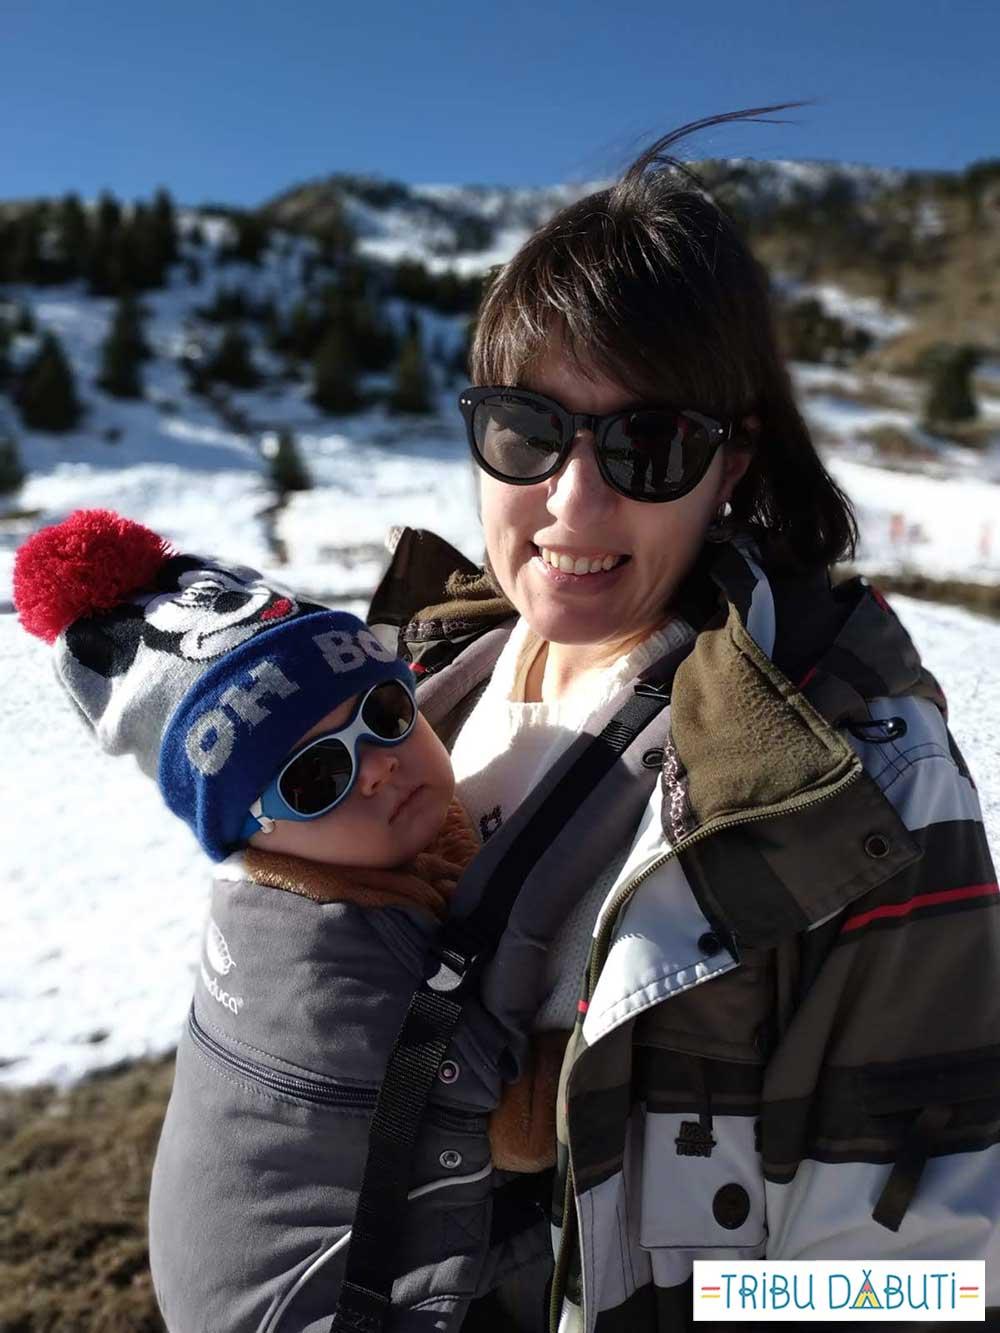 Mochila portabebés para ir a la nieve